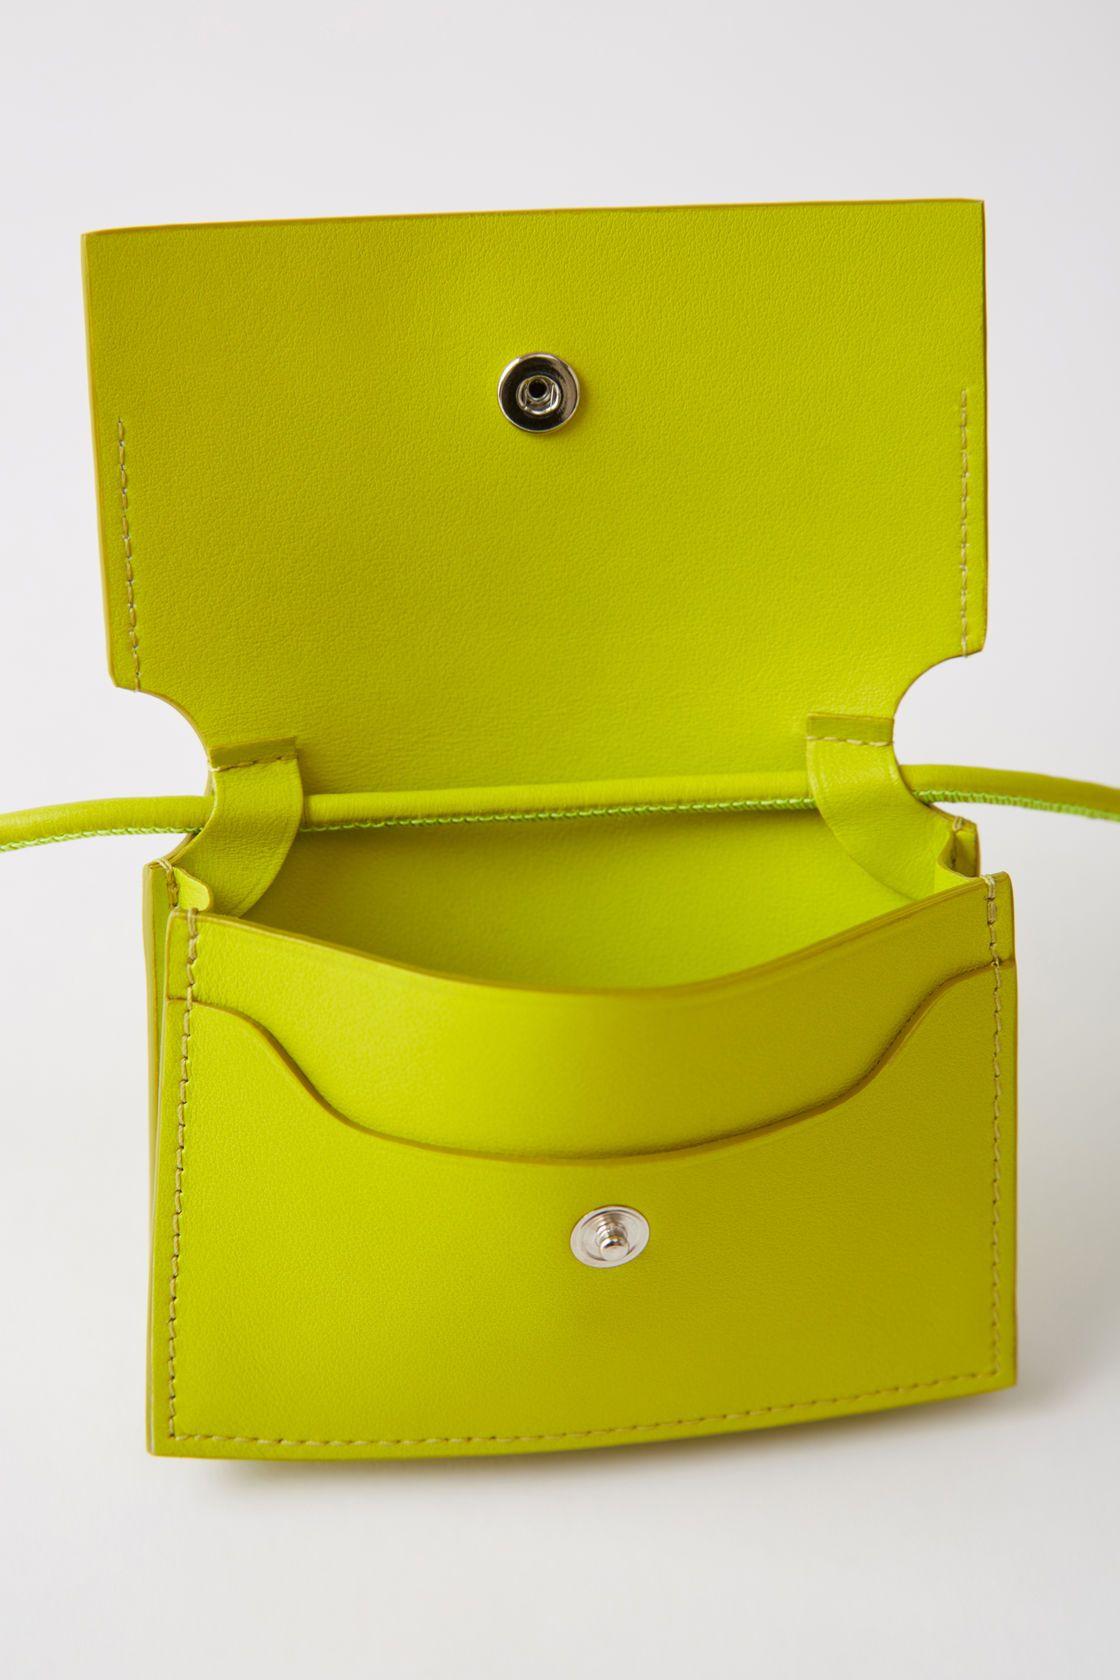 Coin purse lime green $230